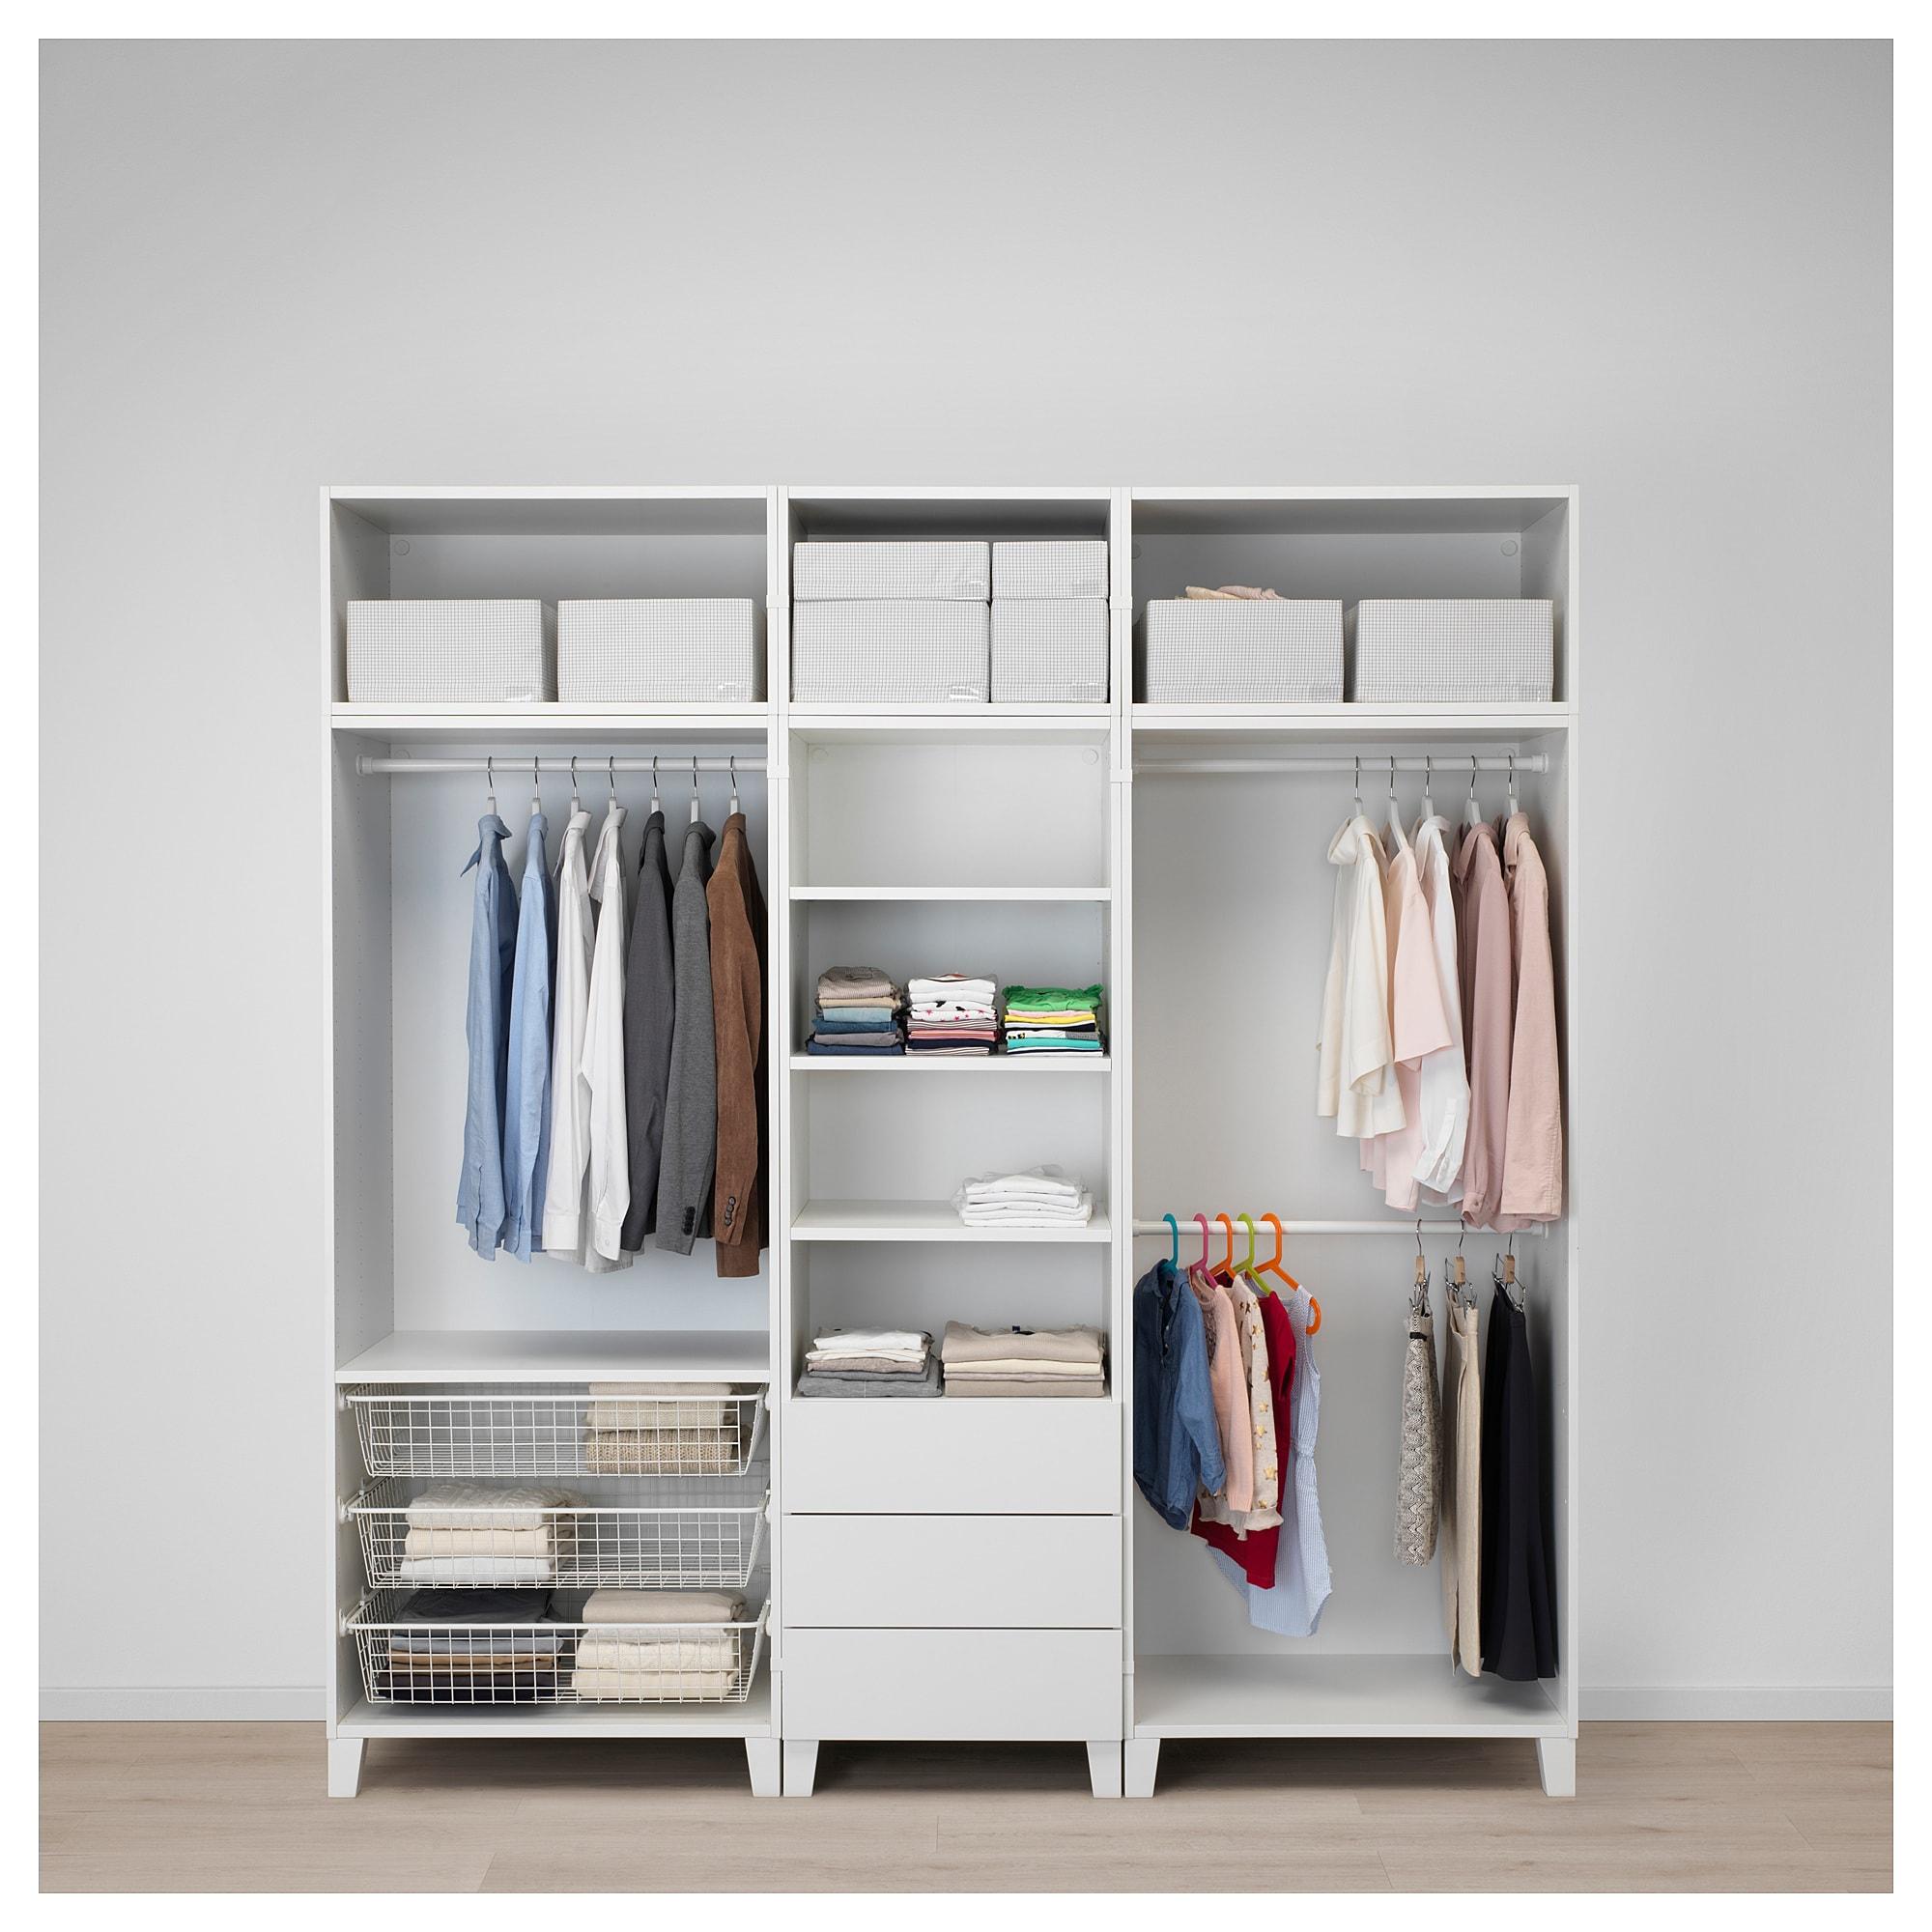 Platsa Kleiderschrank Weiss Sannidal Ridabu In 2020 Ikea Schrank